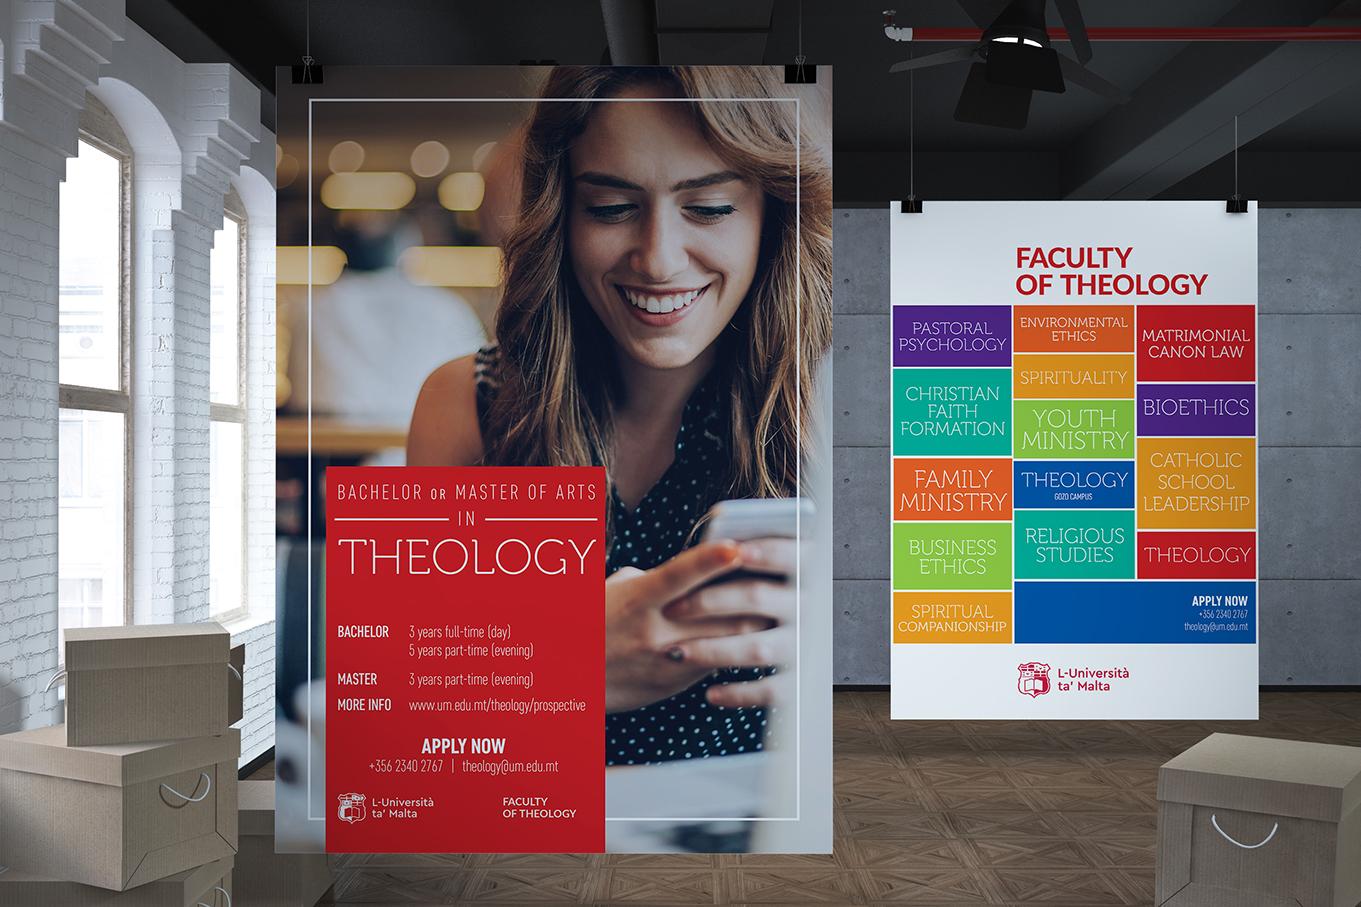 Theology-01.jpg